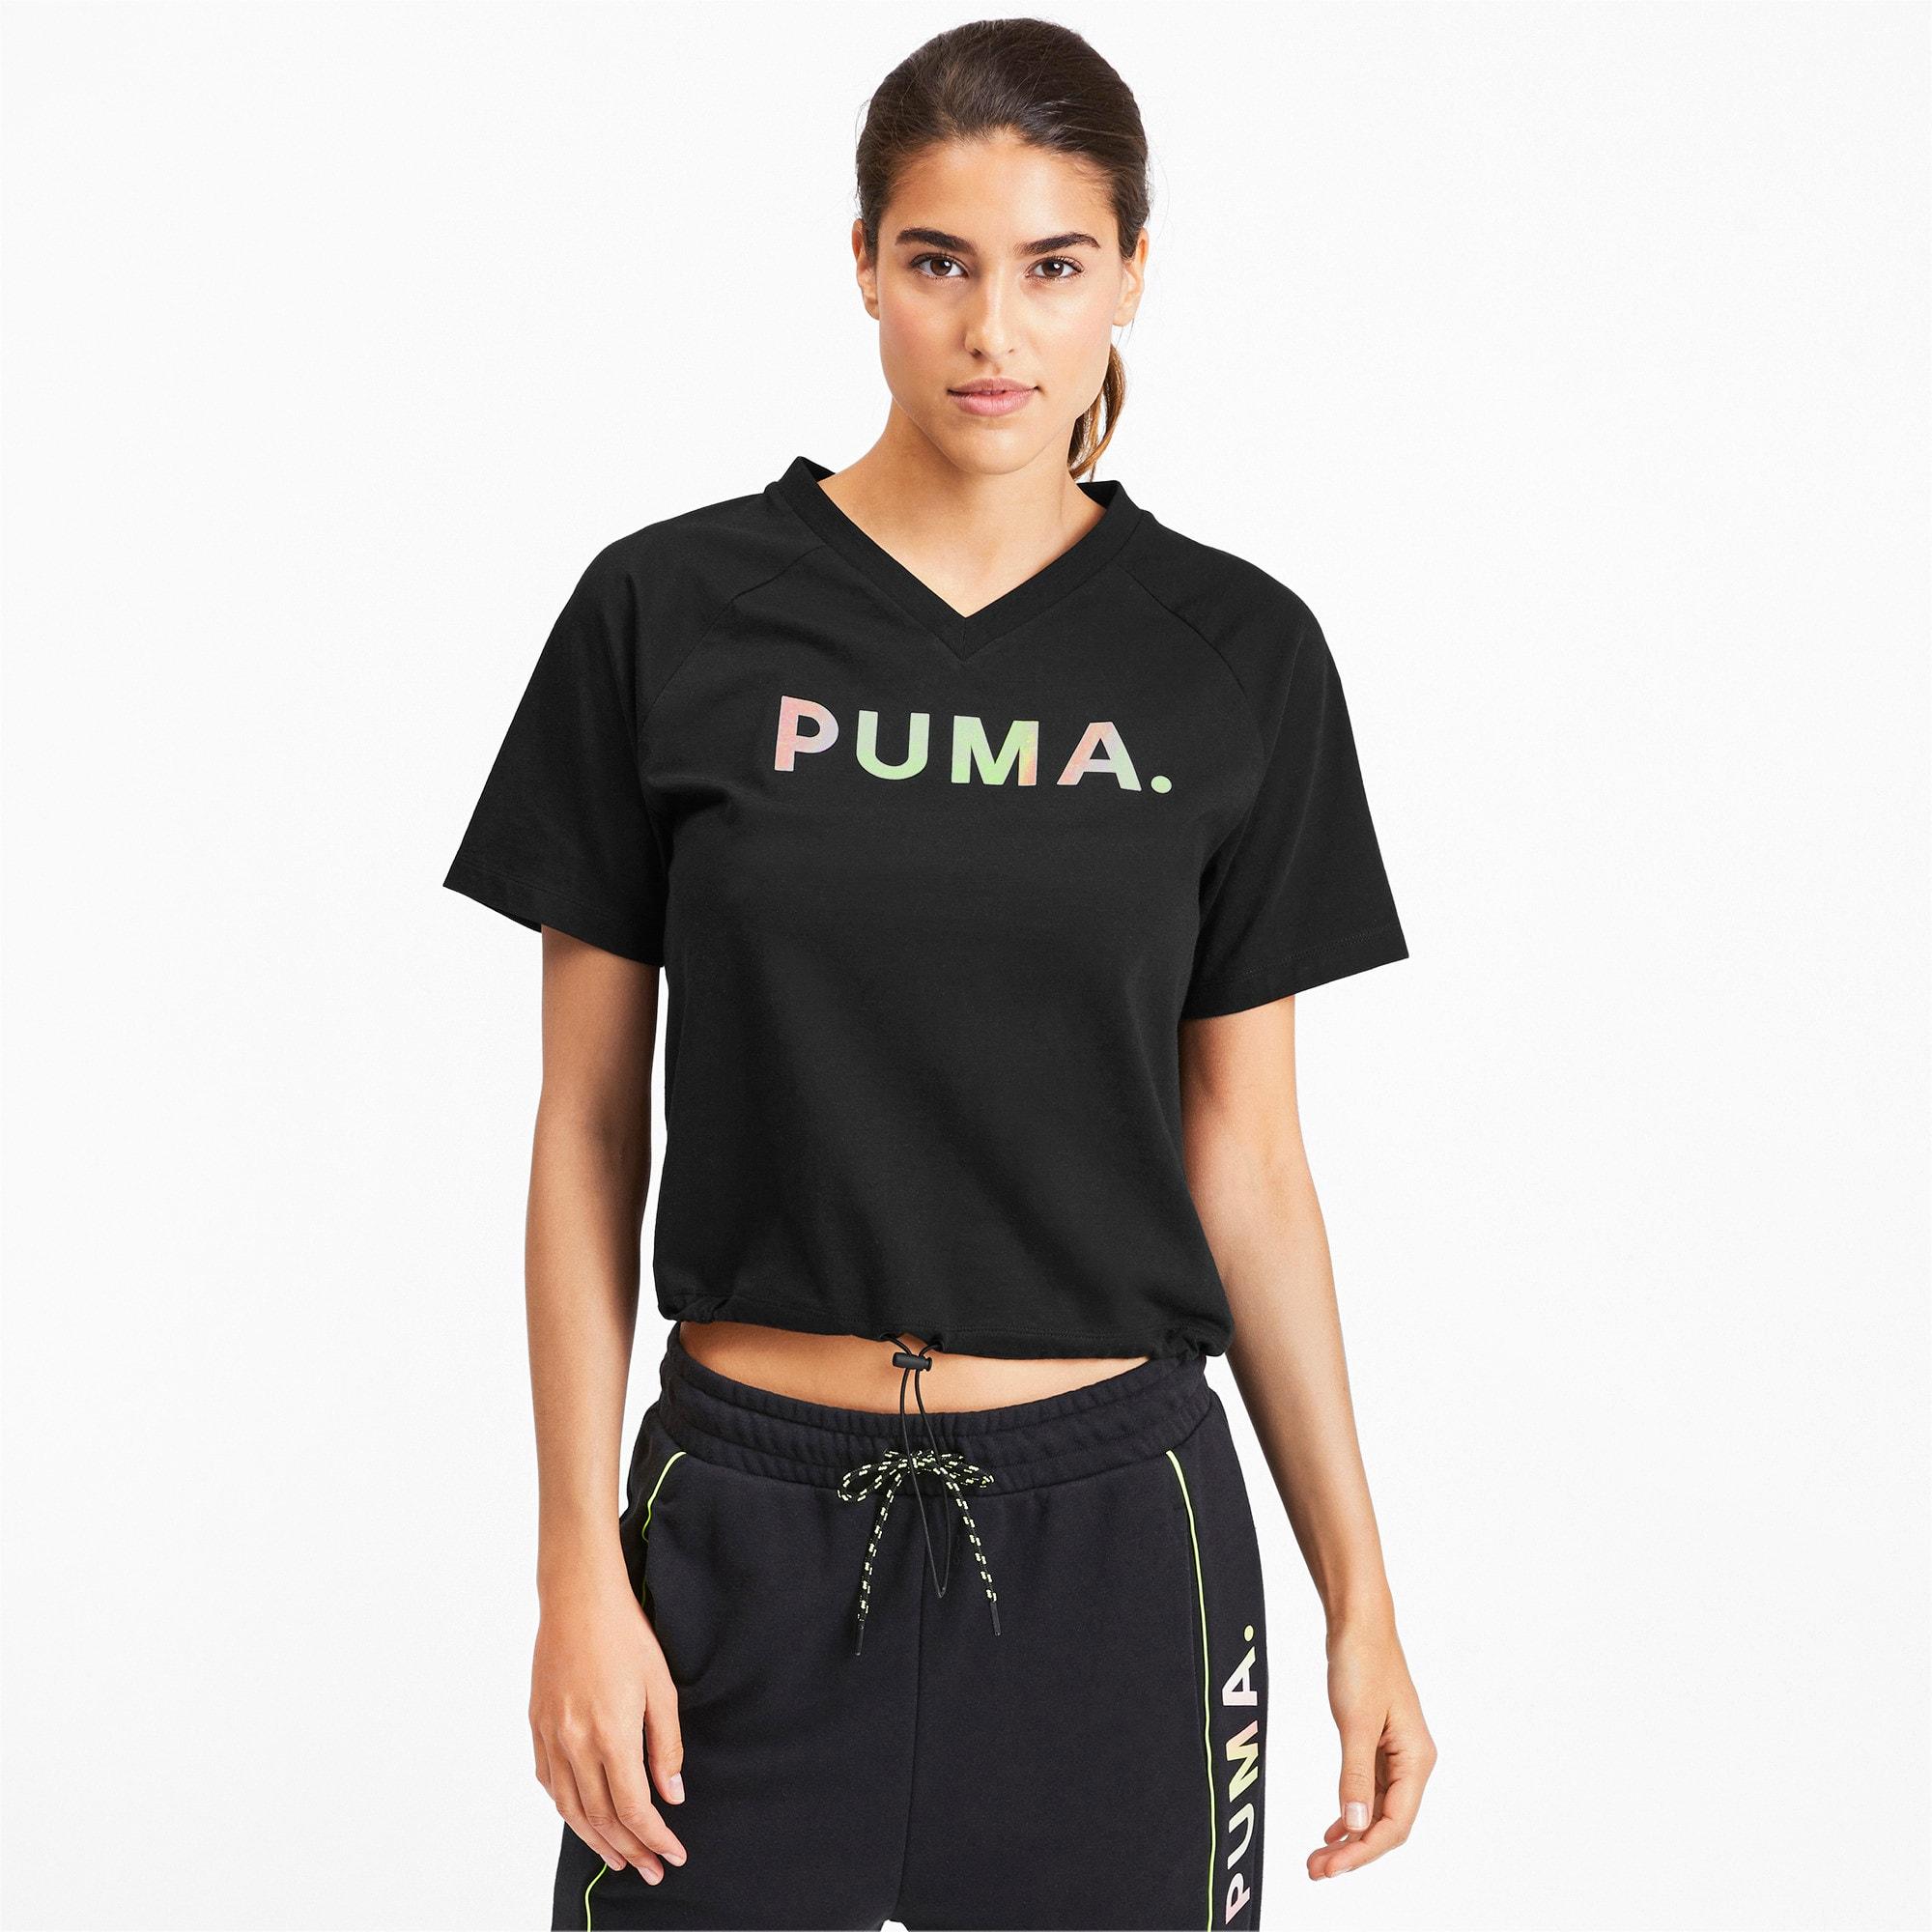 Thumbnail 1 of Chase Women's V-Neck Tee, Puma Black, medium